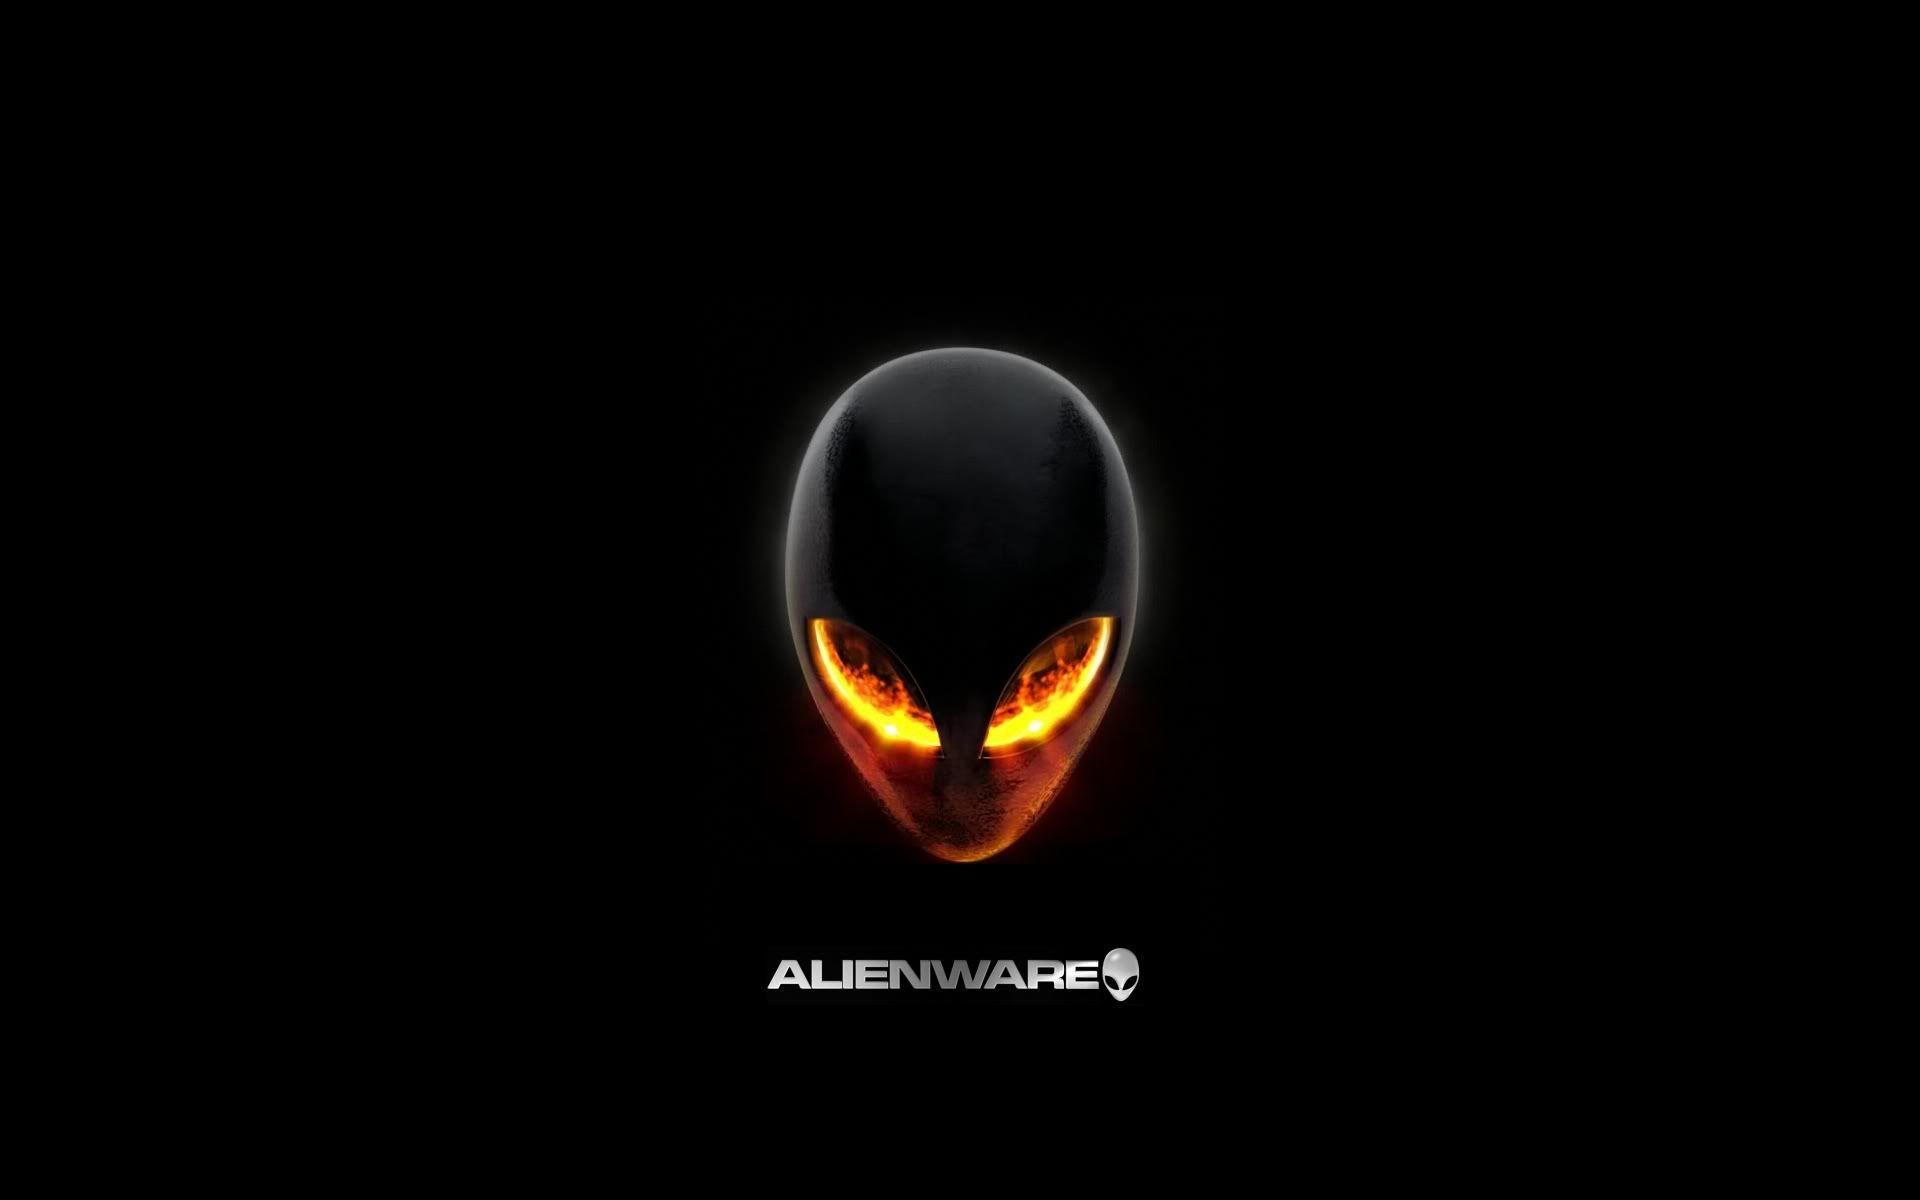 <b>HD Alienware Wallpapers</b> 1920×1080 & <b>Alienware